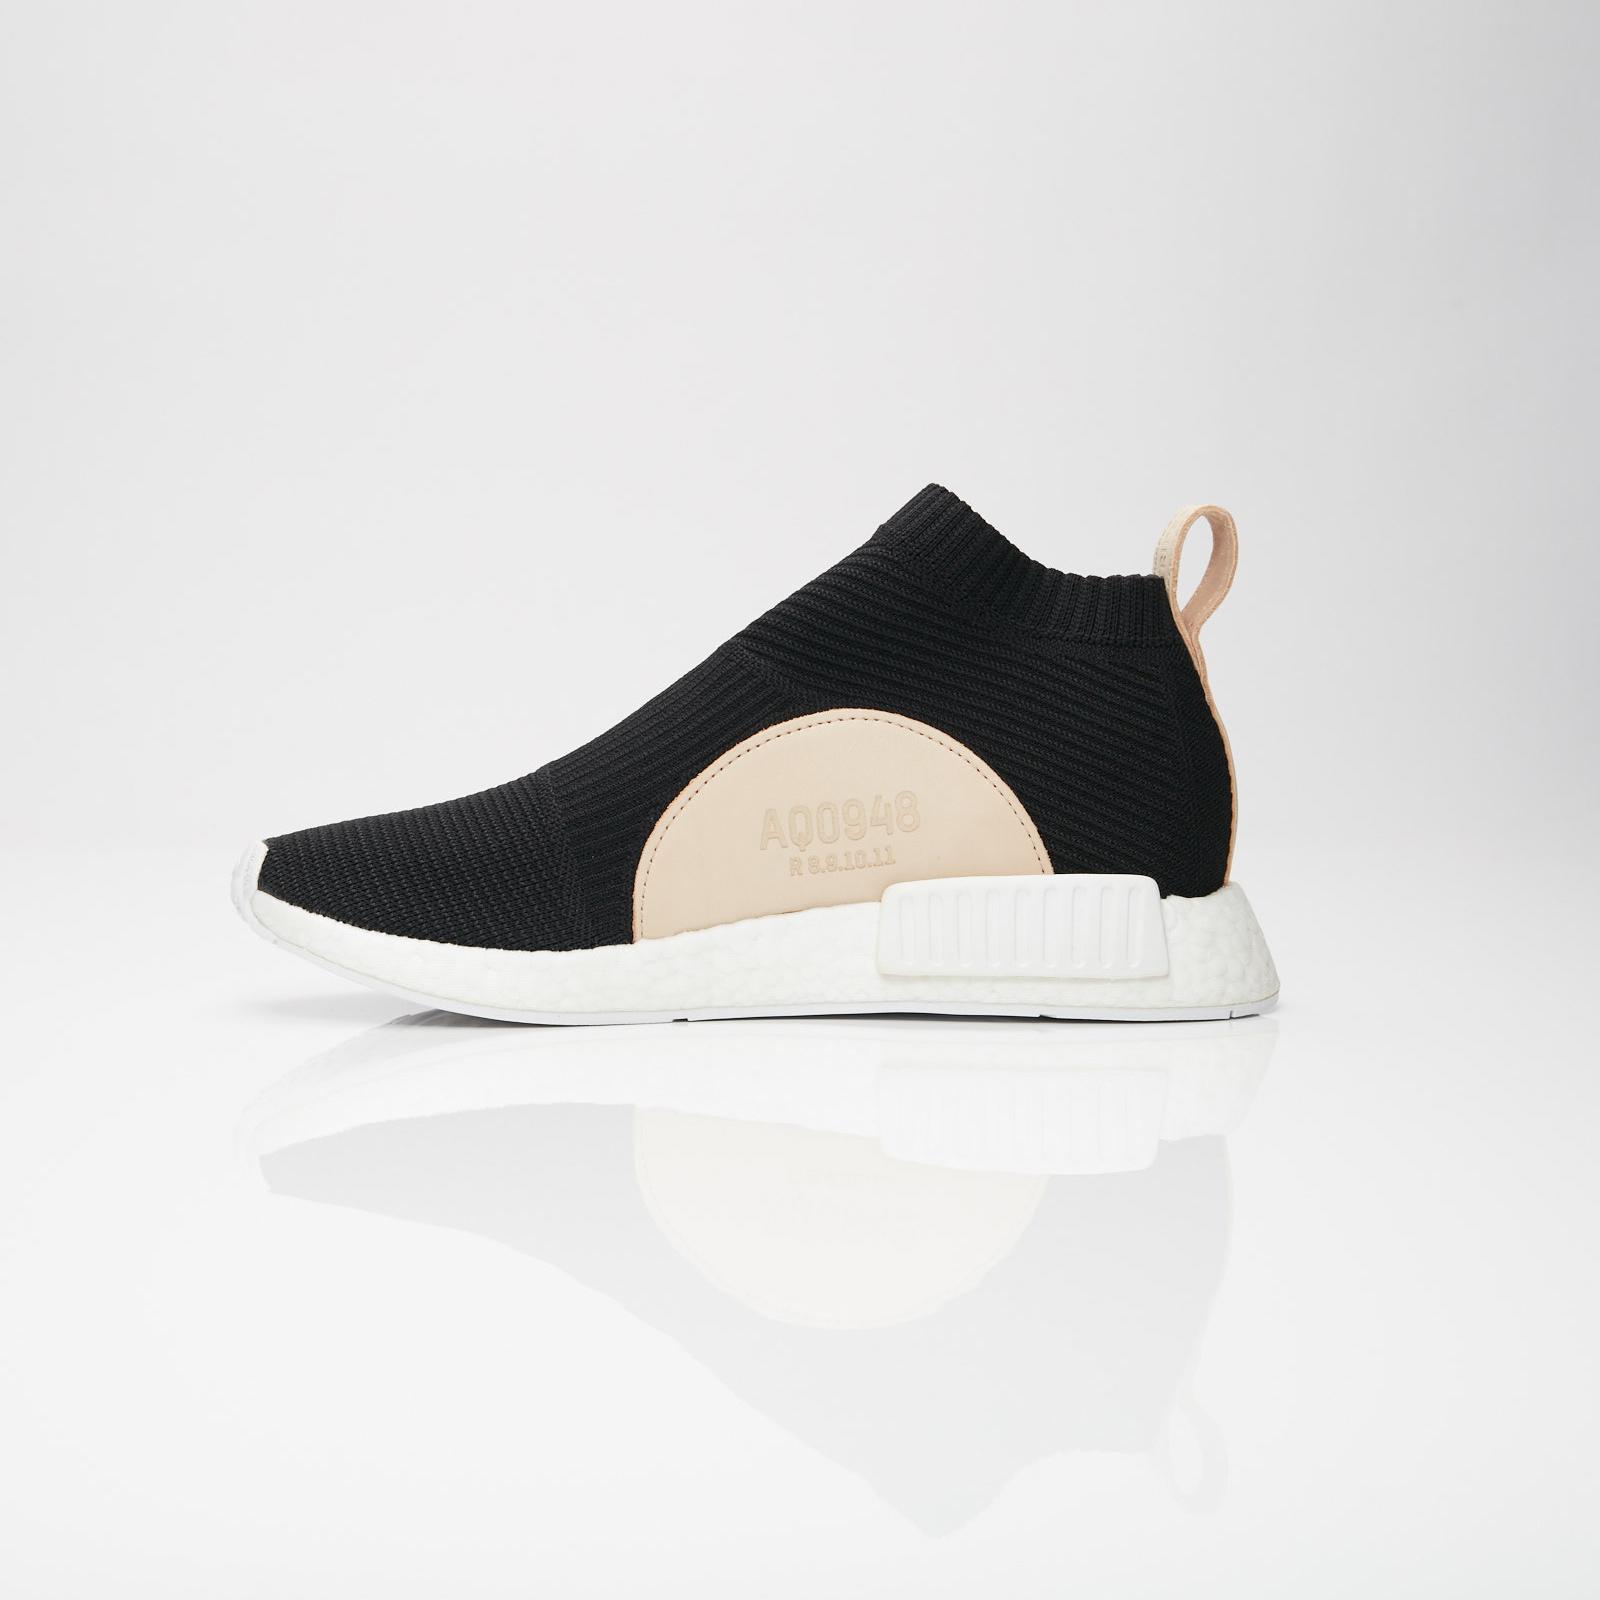 26e801e76 adidas Nmd Cs1 Pk - Aq0948 - Sneakersnstuff